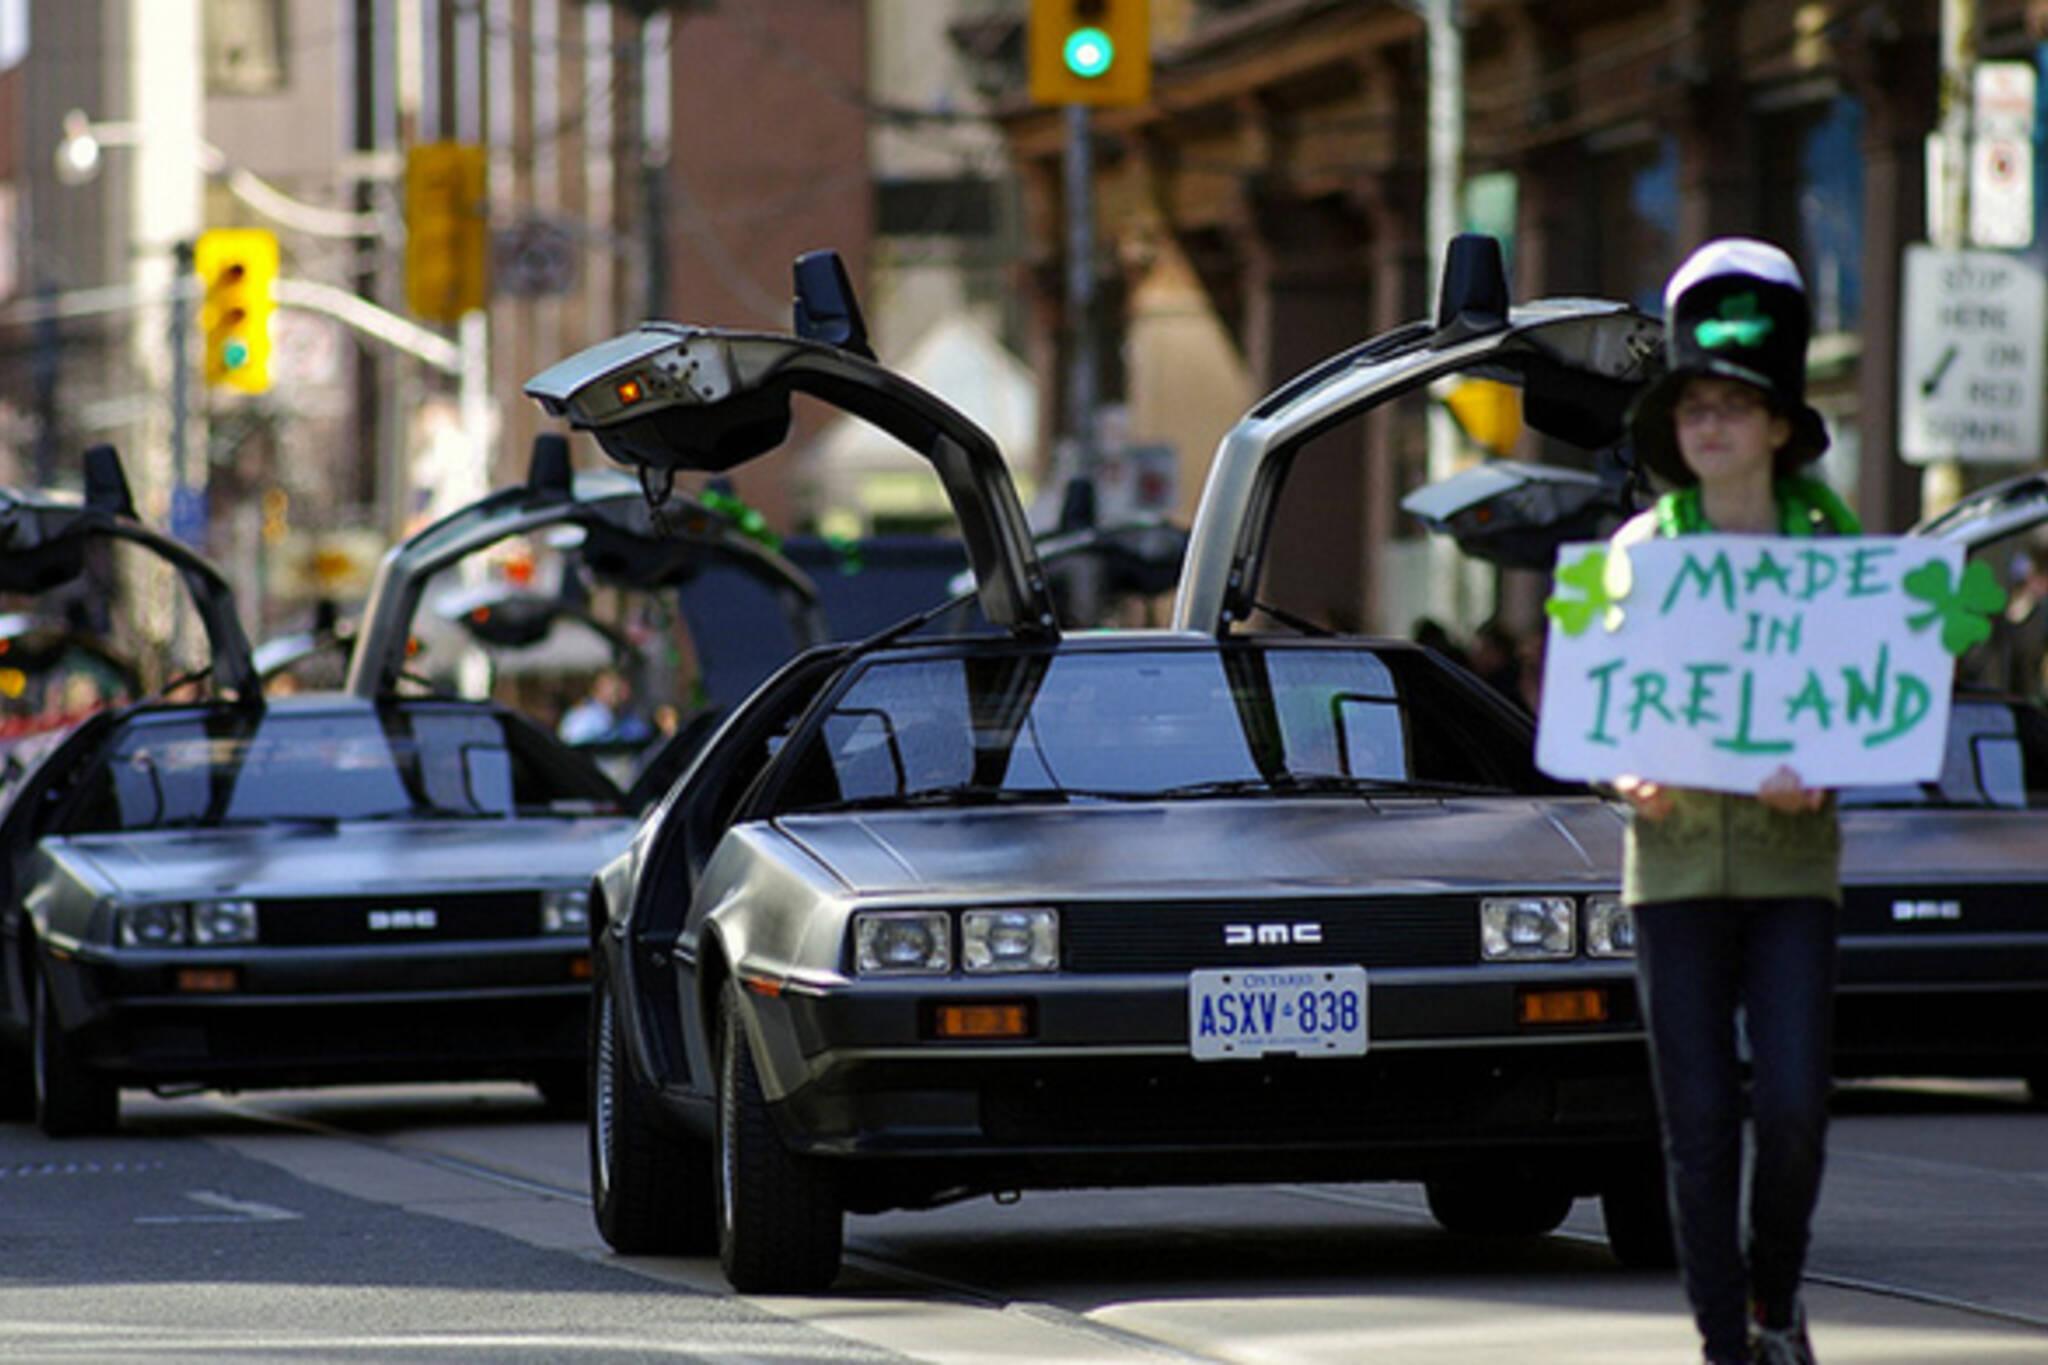 St. Patrick's Day Parade Toronto